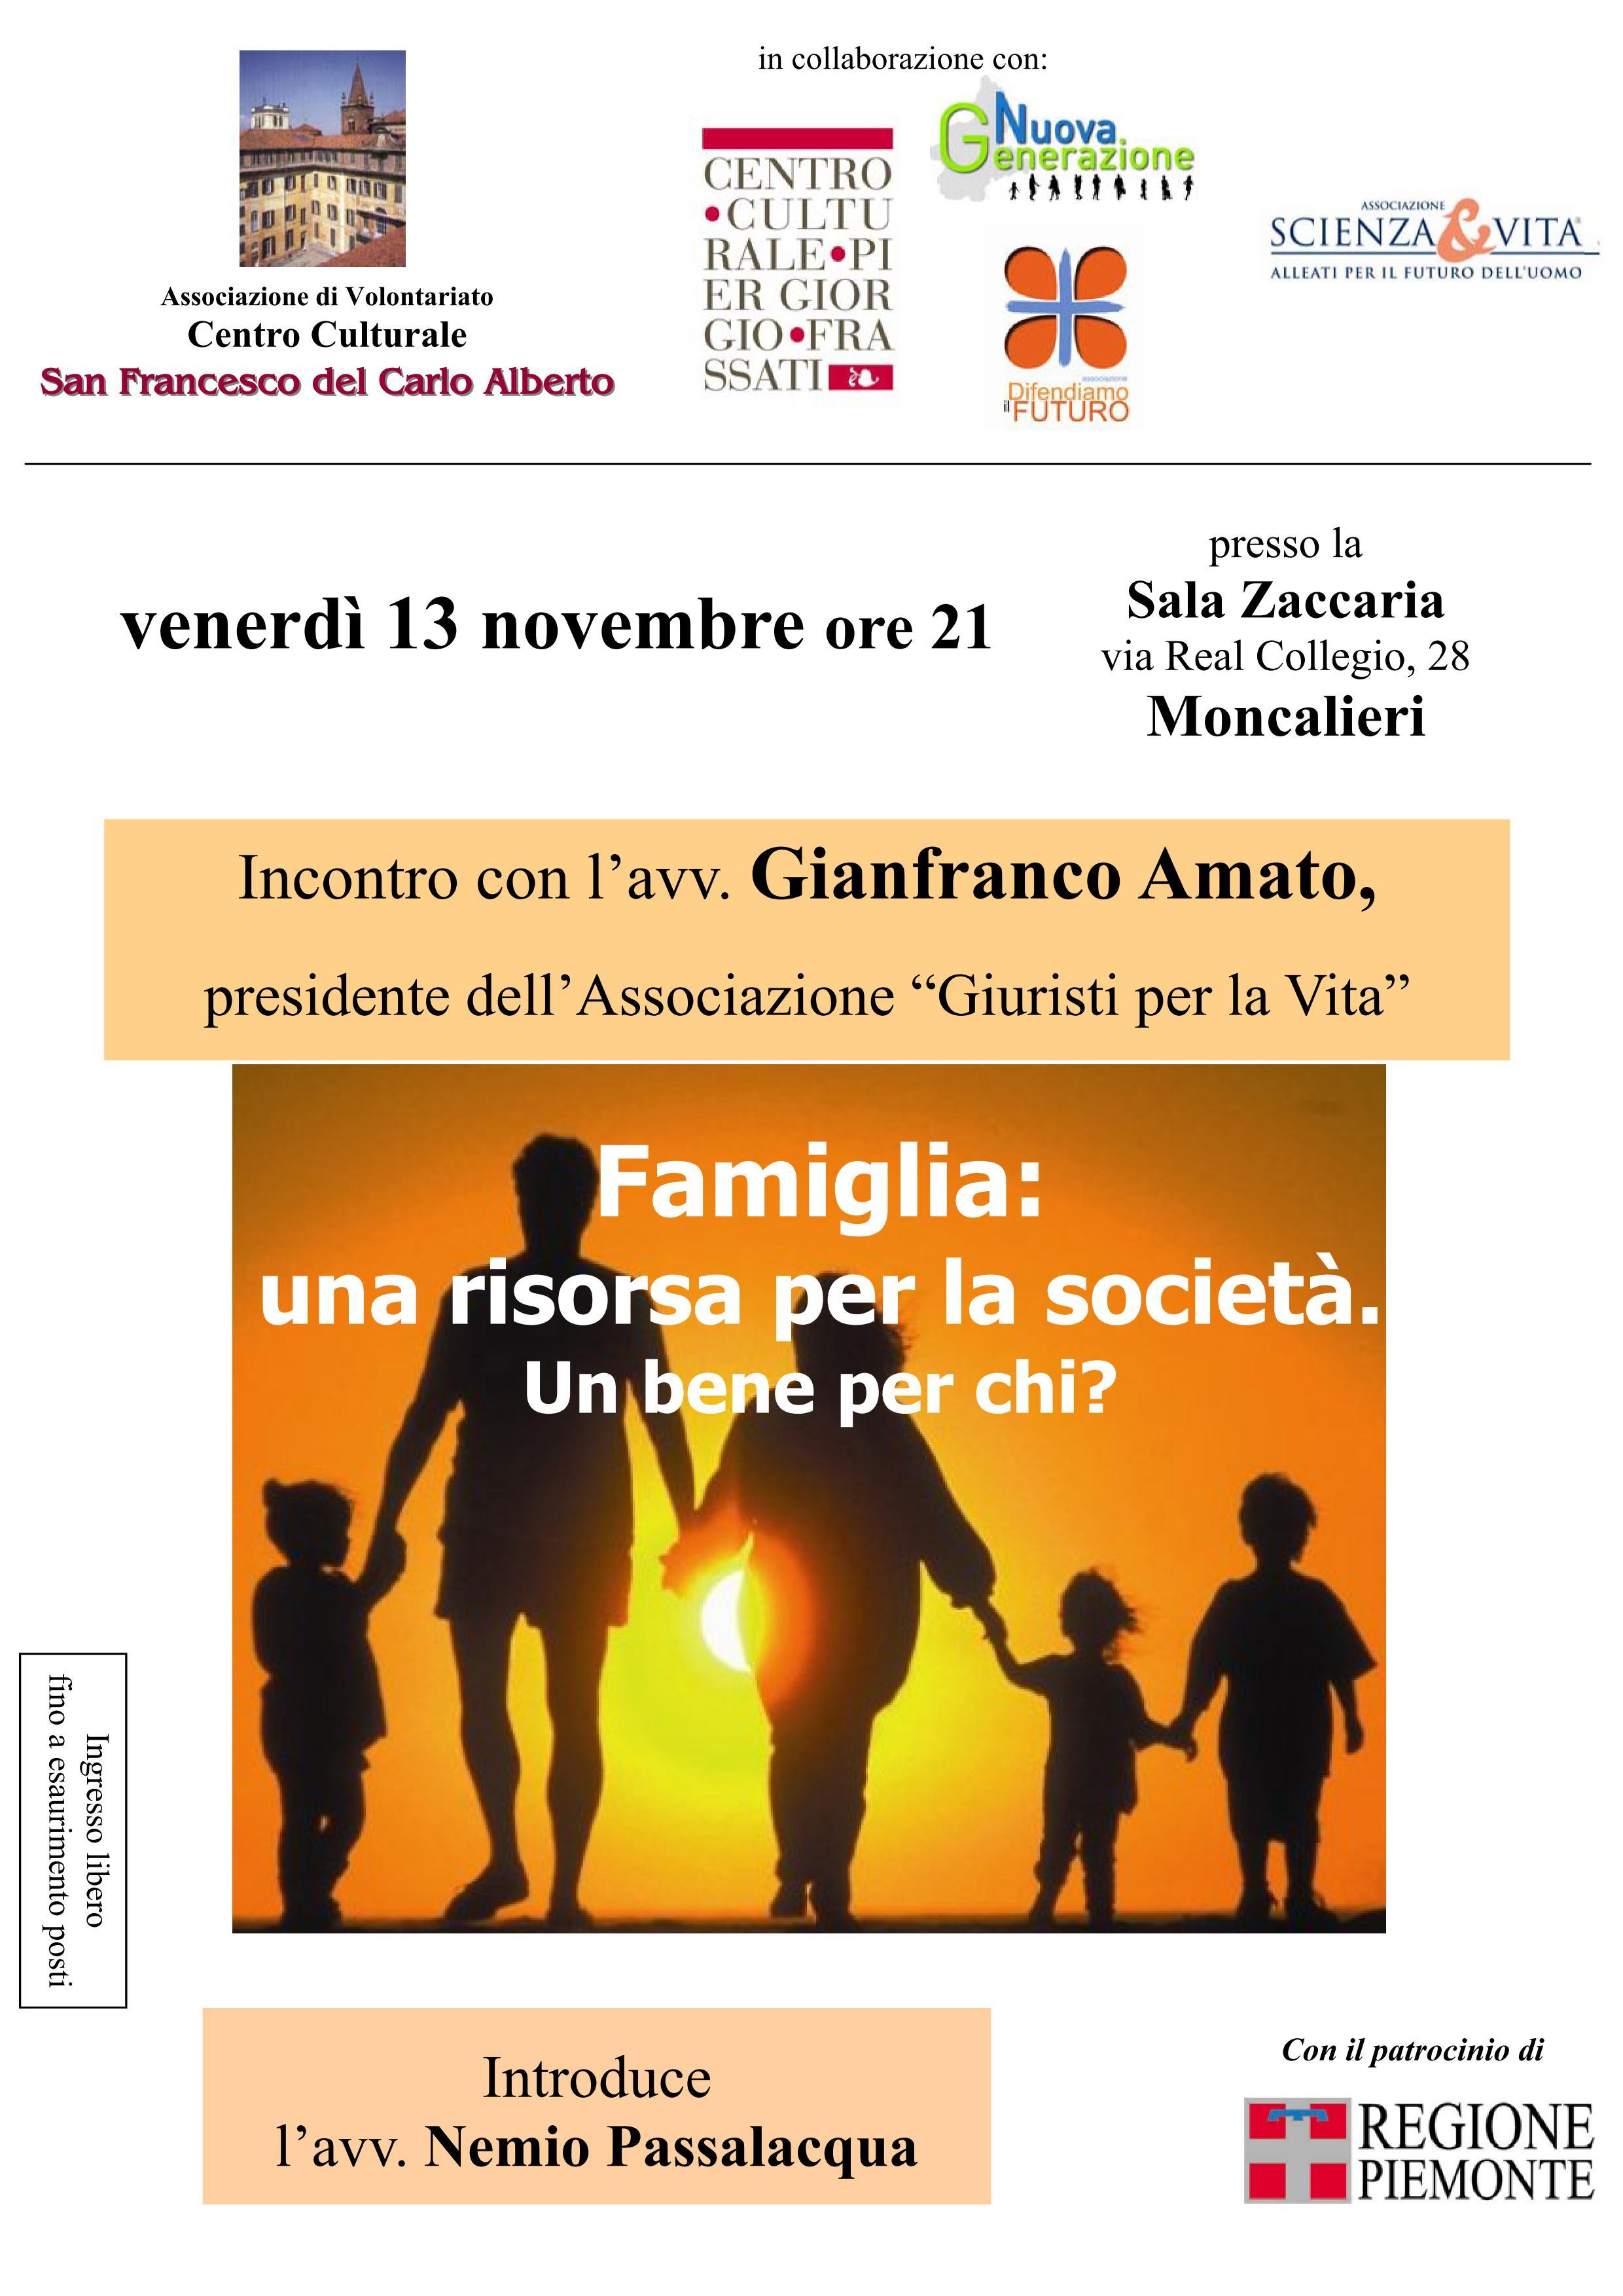 Incontro con Gianfranco Amato